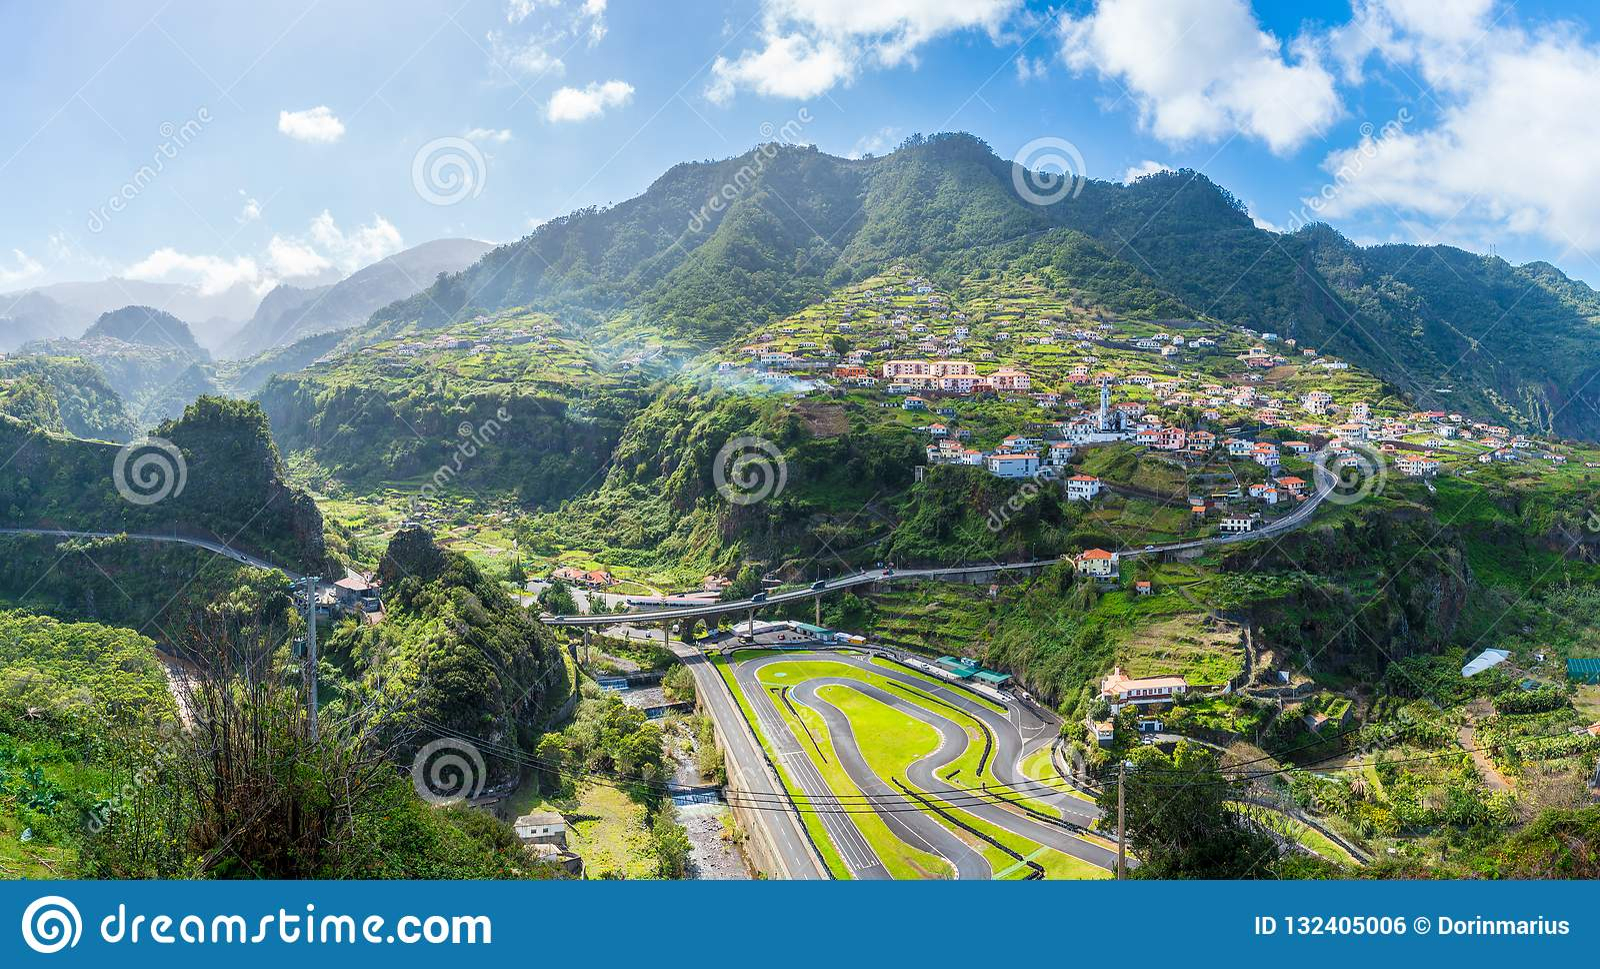 madeira kart Faial Village And Go kart Track, Madeira Island, Portugal Stock